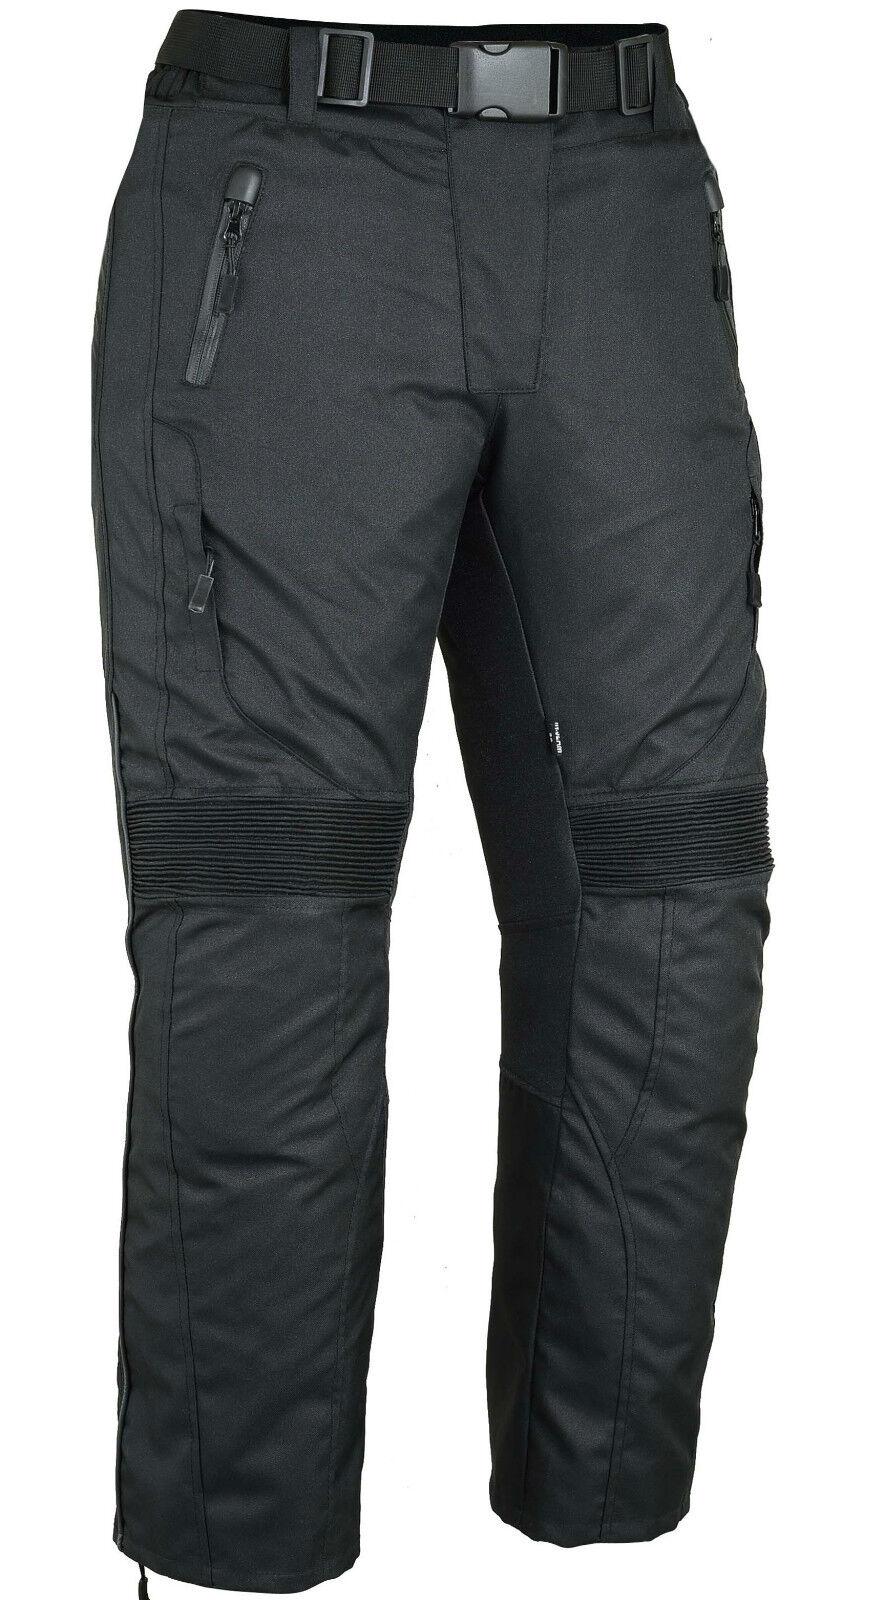 GearX damen Motorcycle Protection Trousers Waterproof Motorbike Pants